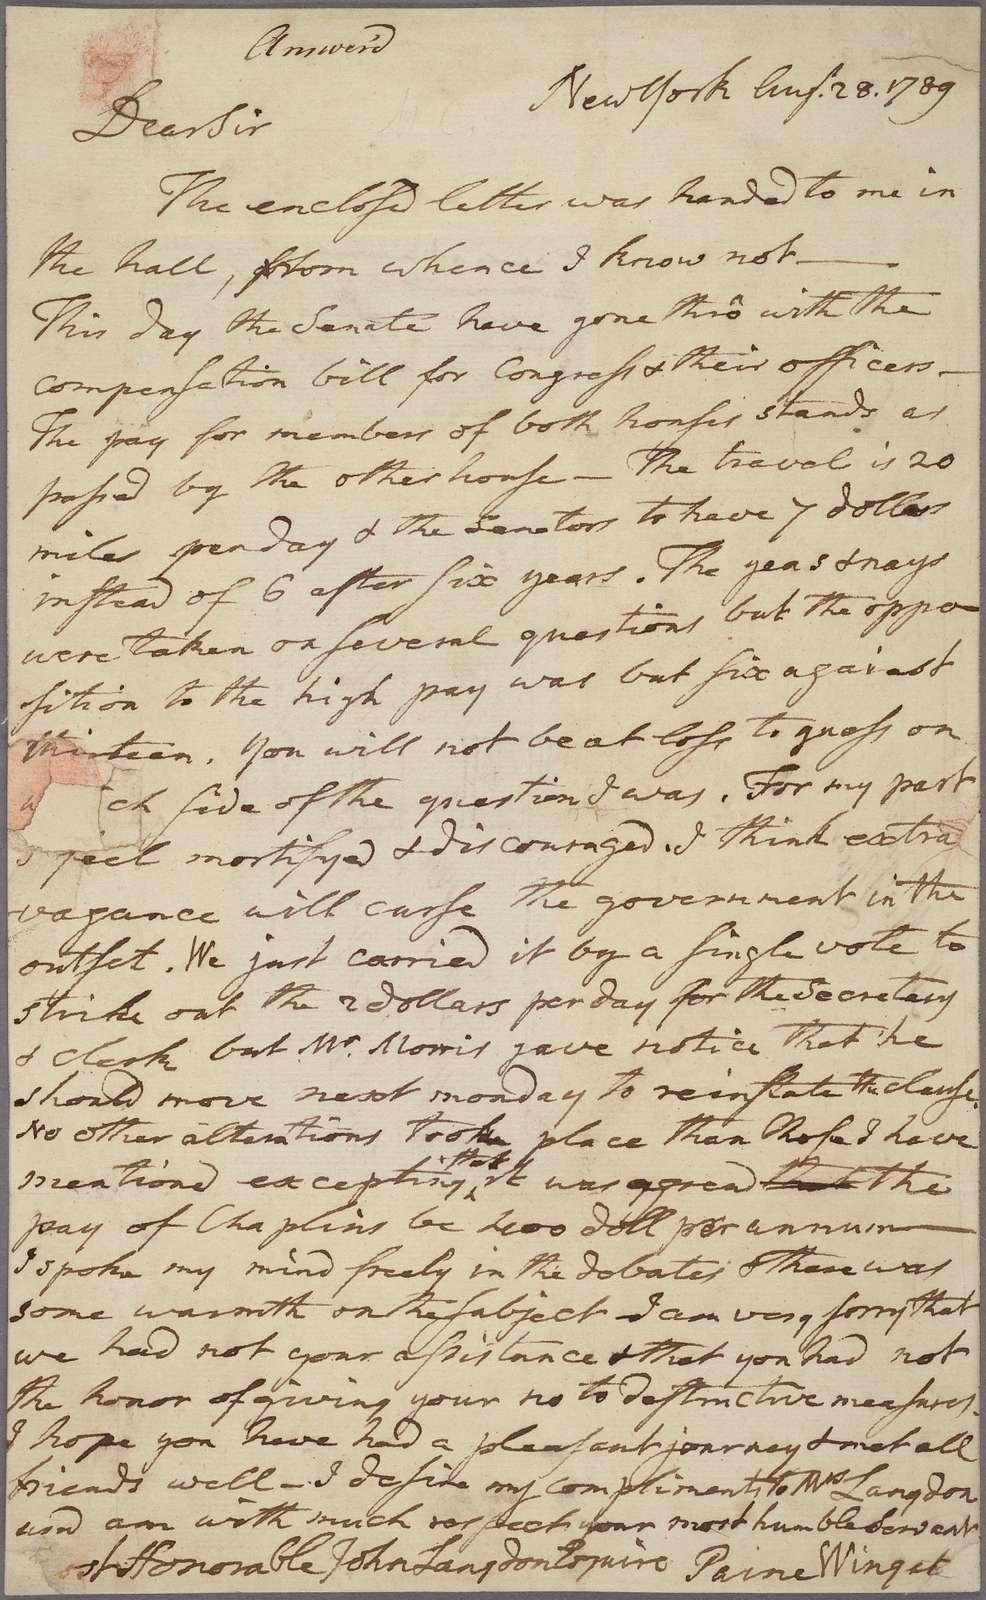 Letter to John Langdon, Portsmouth [N. H.]